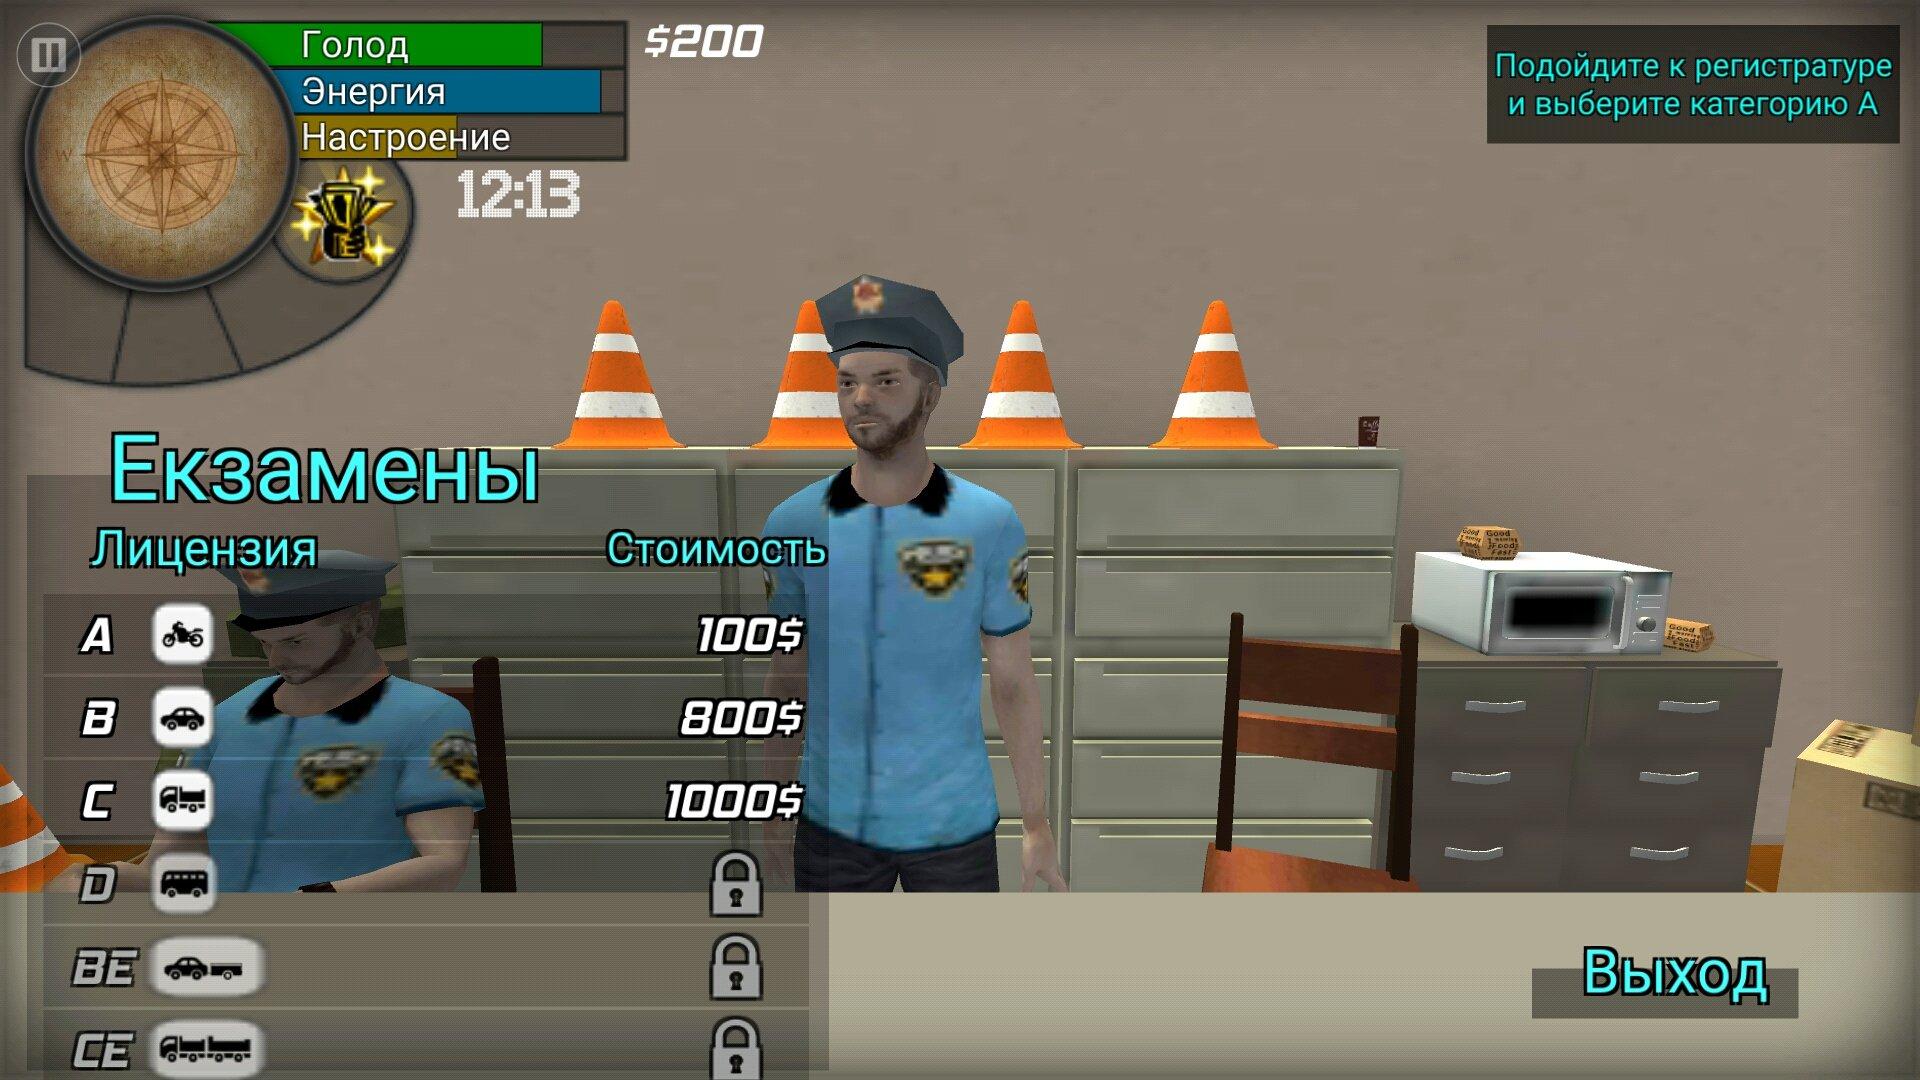 МОД: Много денег] Big City Life: Simulator - Android games